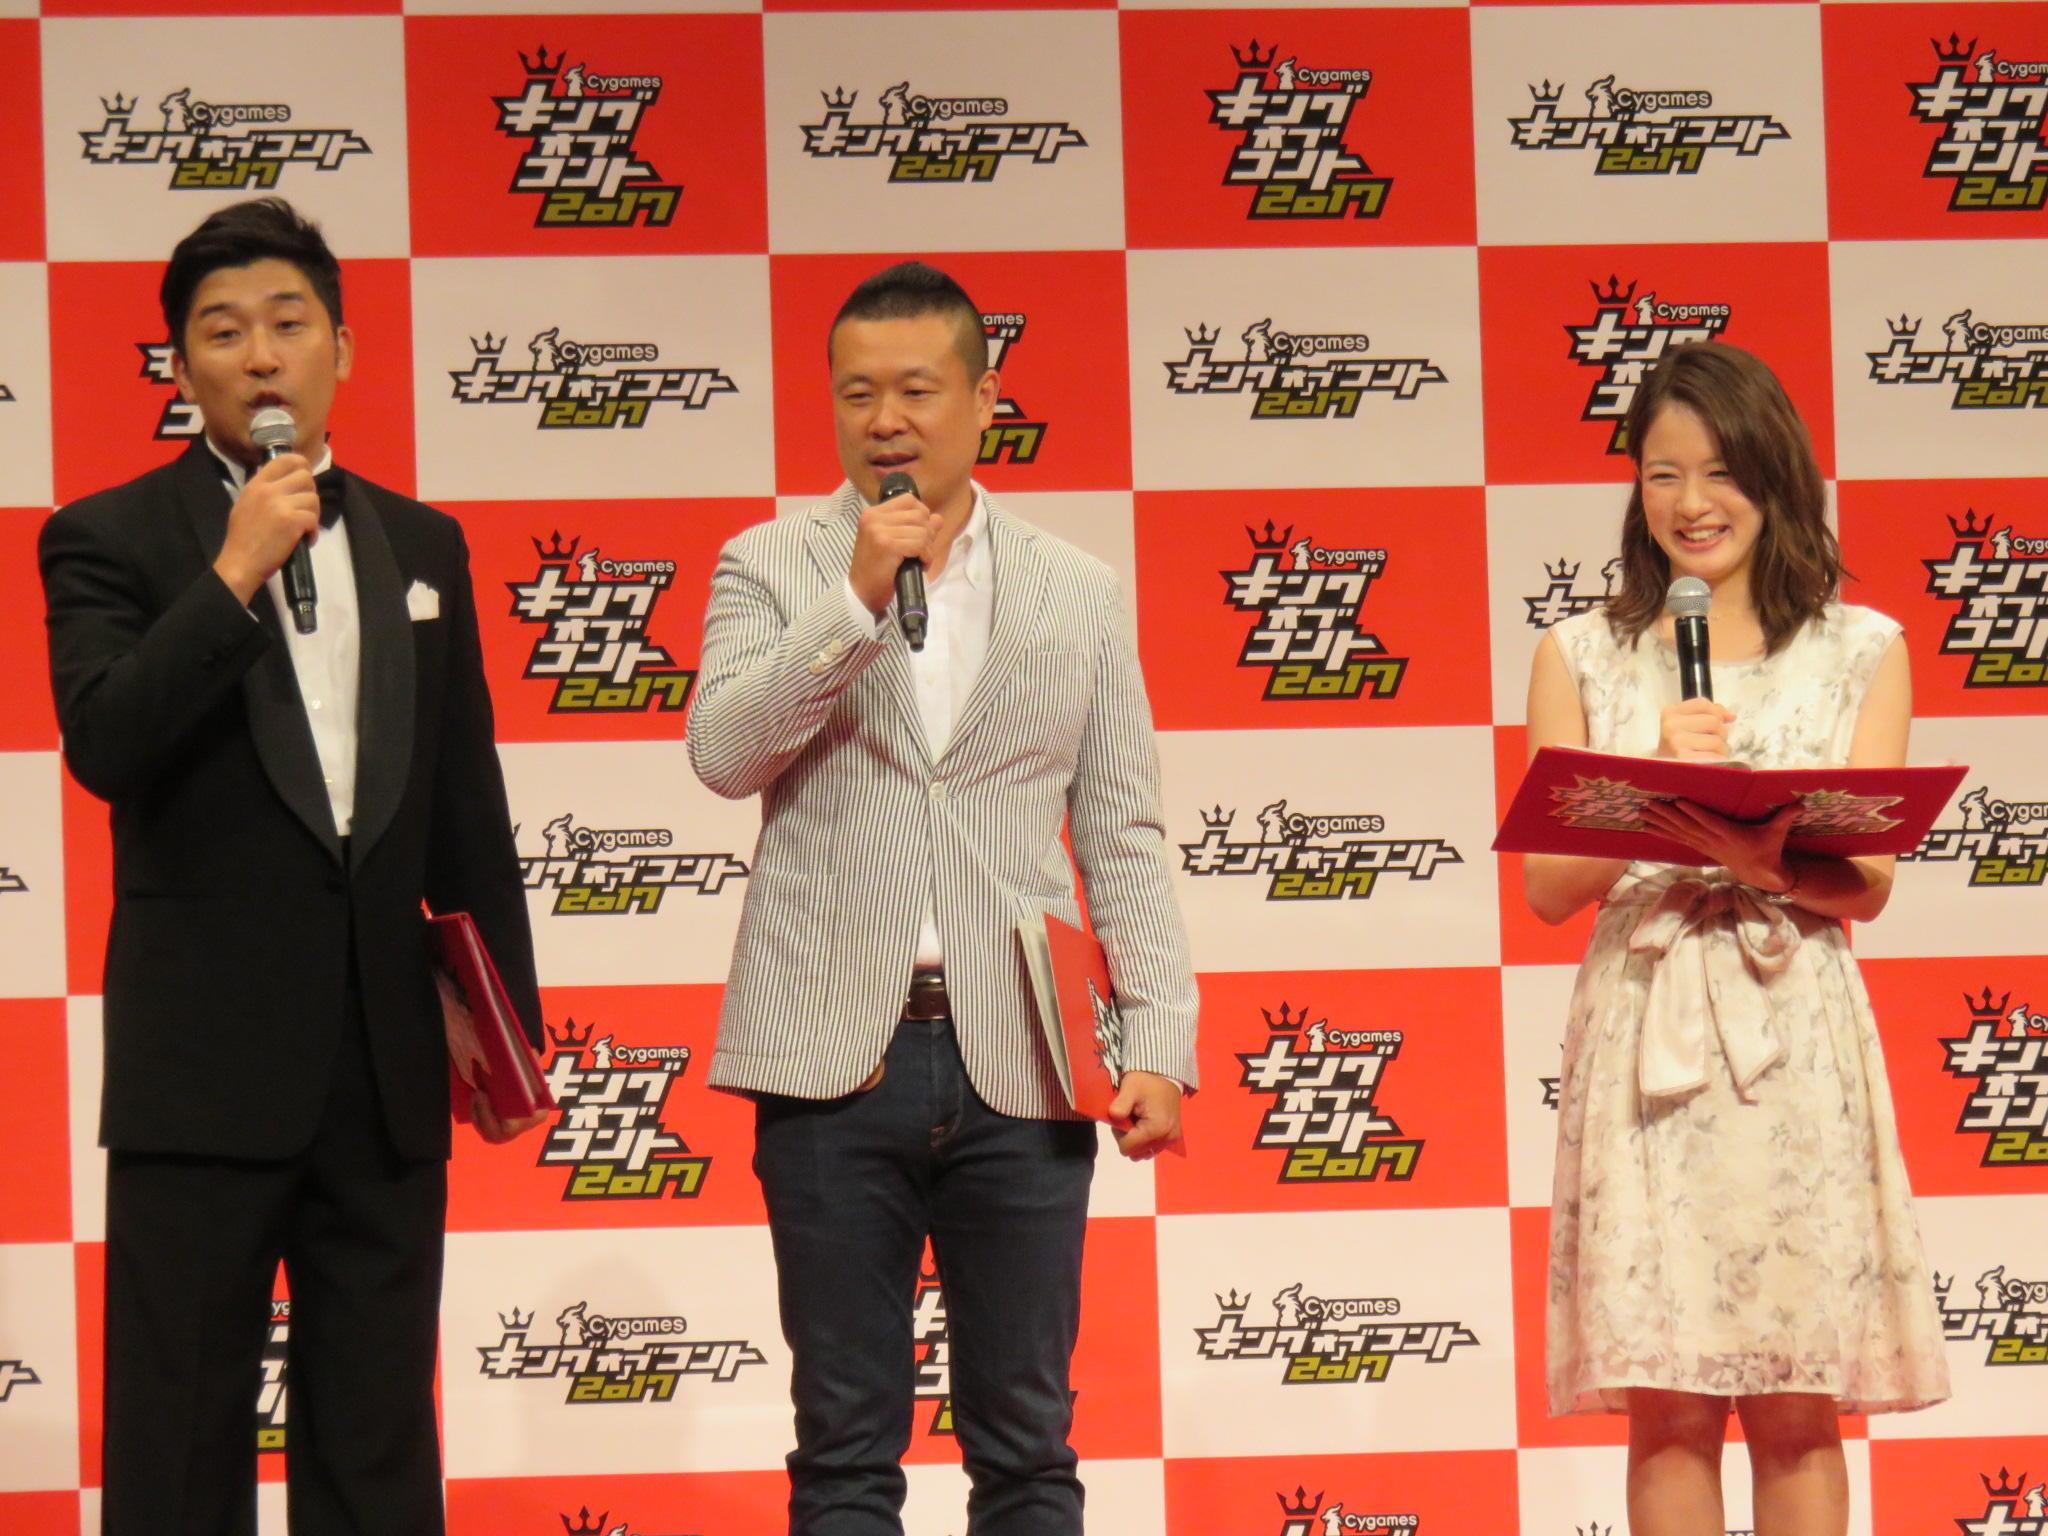 http://news.yoshimoto.co.jp/20170909005050-c07eeb6220c9a5ec55d27f61e94a178f9abd0493.jpg